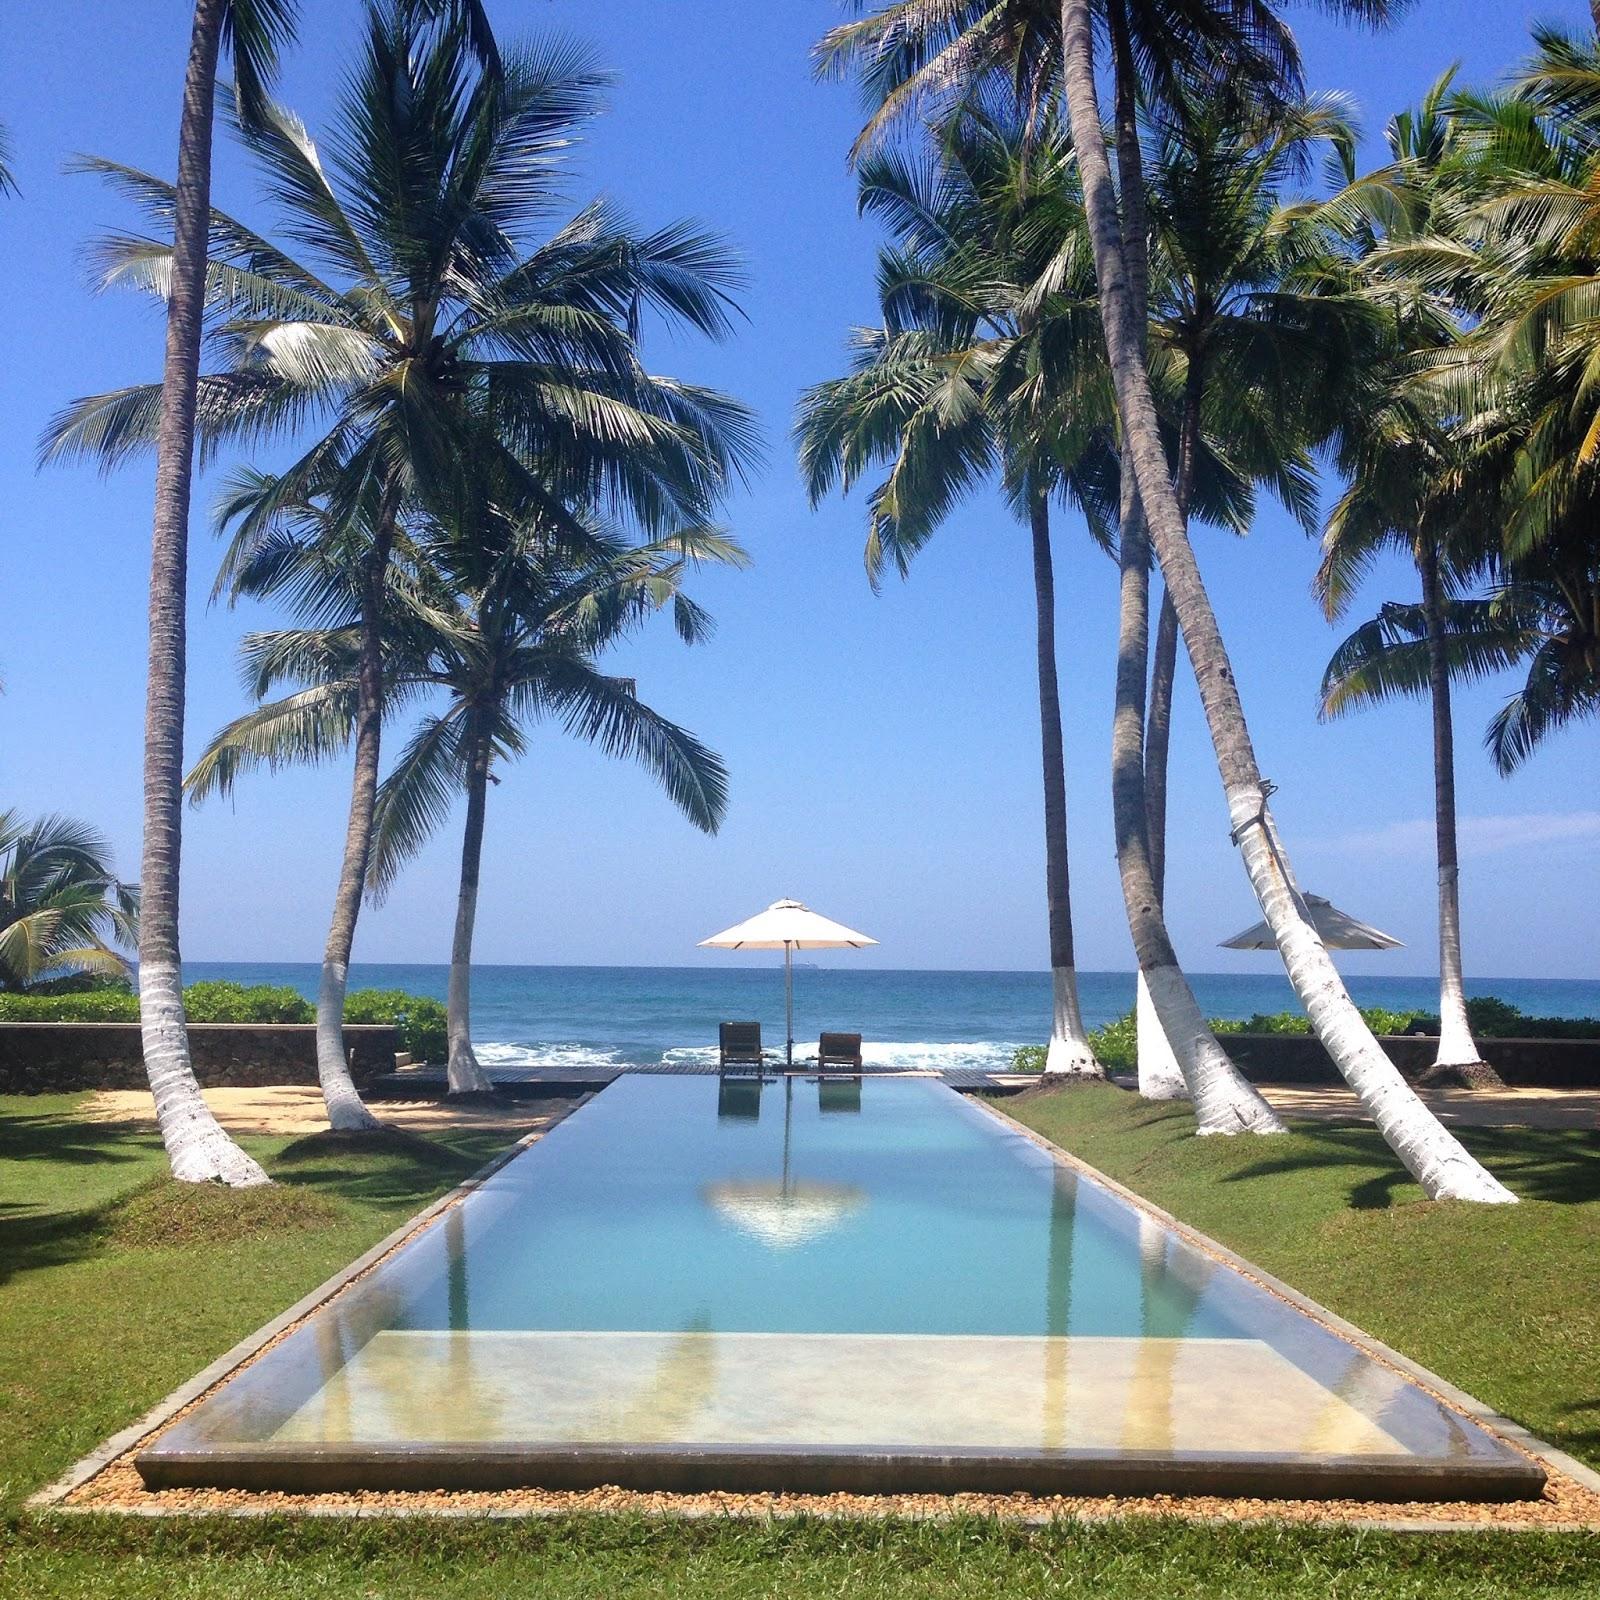 Desert Island Beach: Top 5 Songs On My Desert Island Travel Playlist